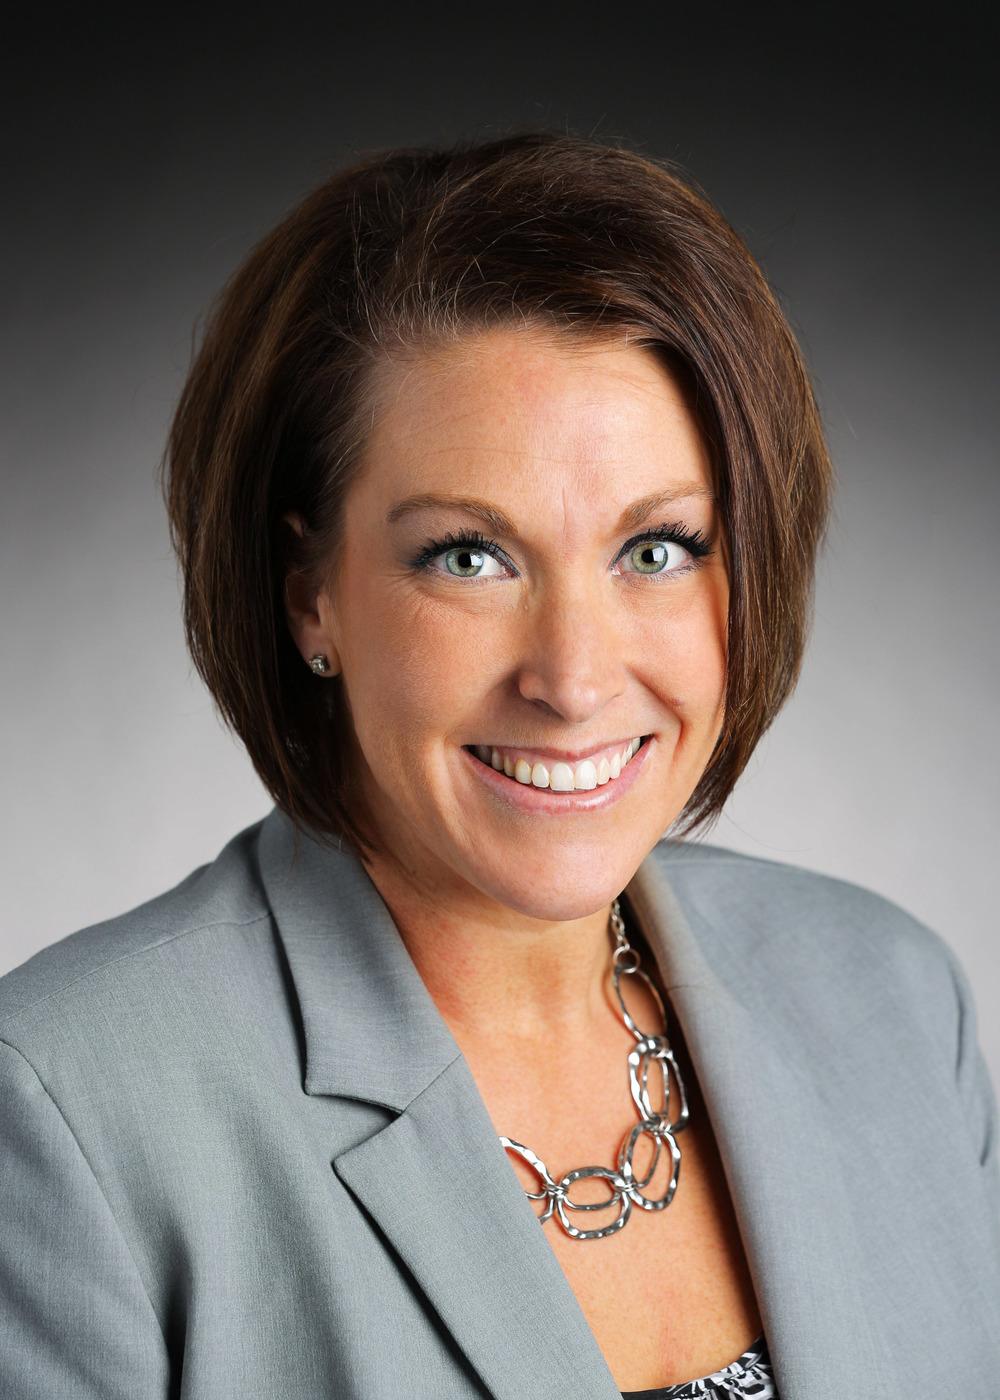 Kristi Gauthier Clark Hill Source:http://www.clarkhill.com/Attorney/kgauthier